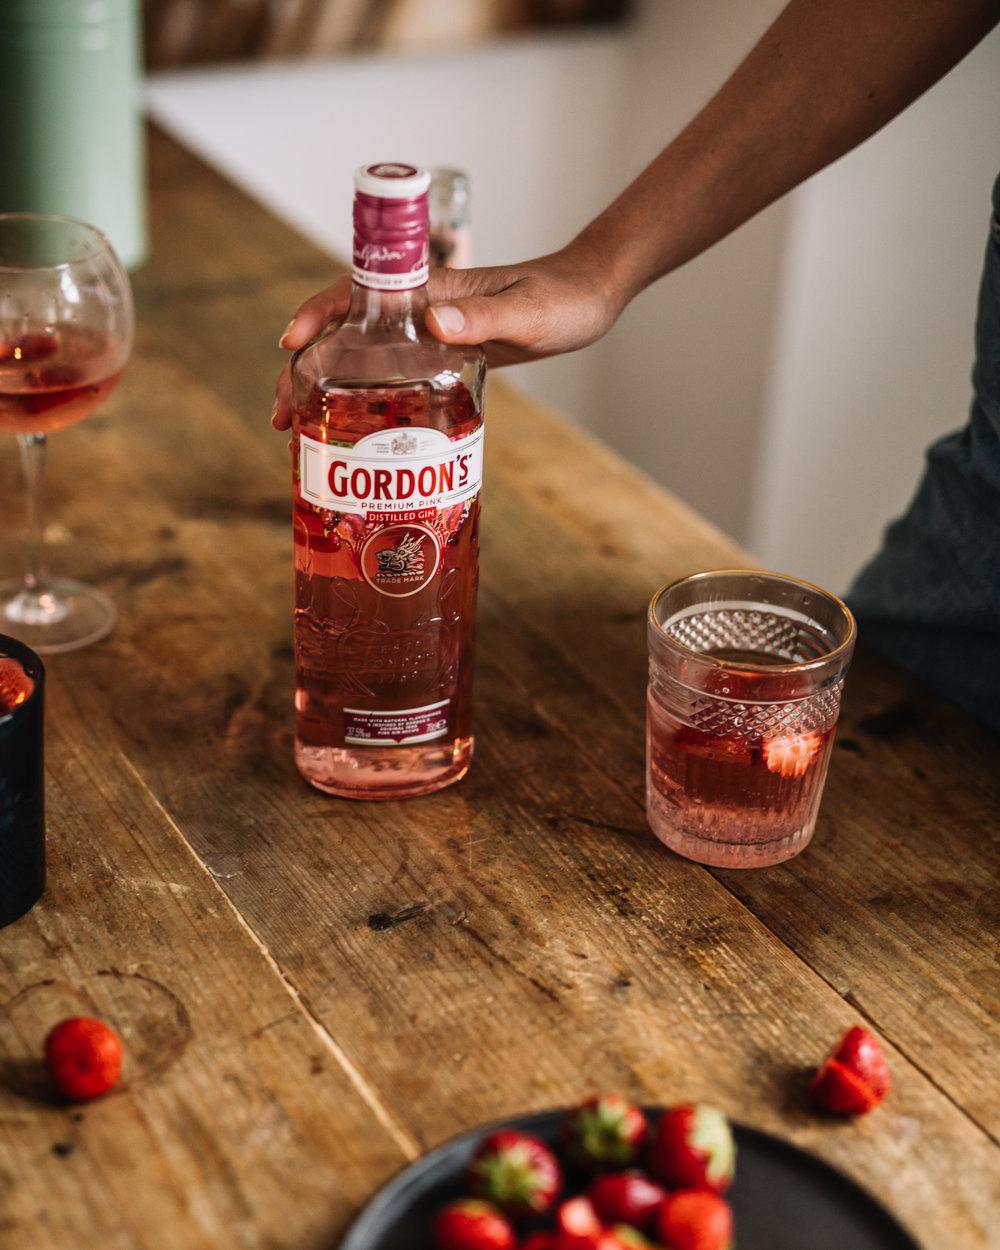 #Letscocktail Gordons Pink Gin 201811.jpg